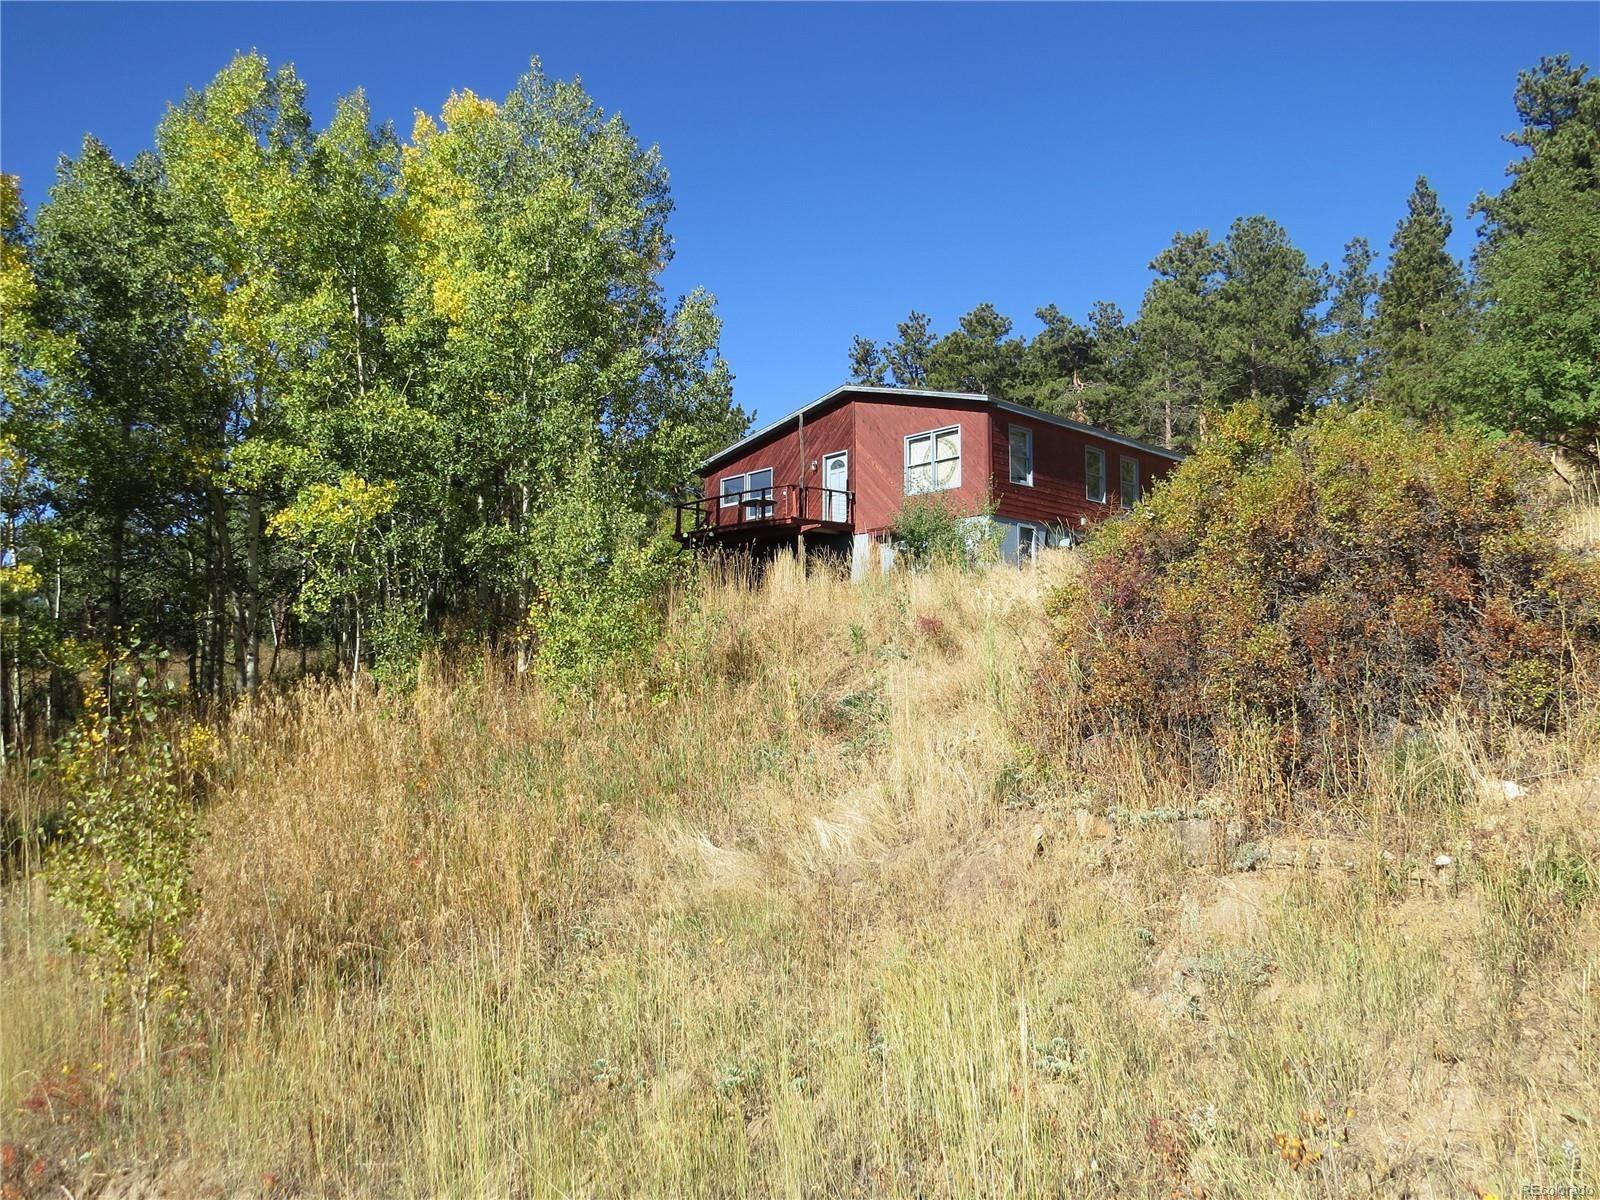 MLS# 9251839 - 6 - 50 Navajo Trail, Nederland, CO 80466